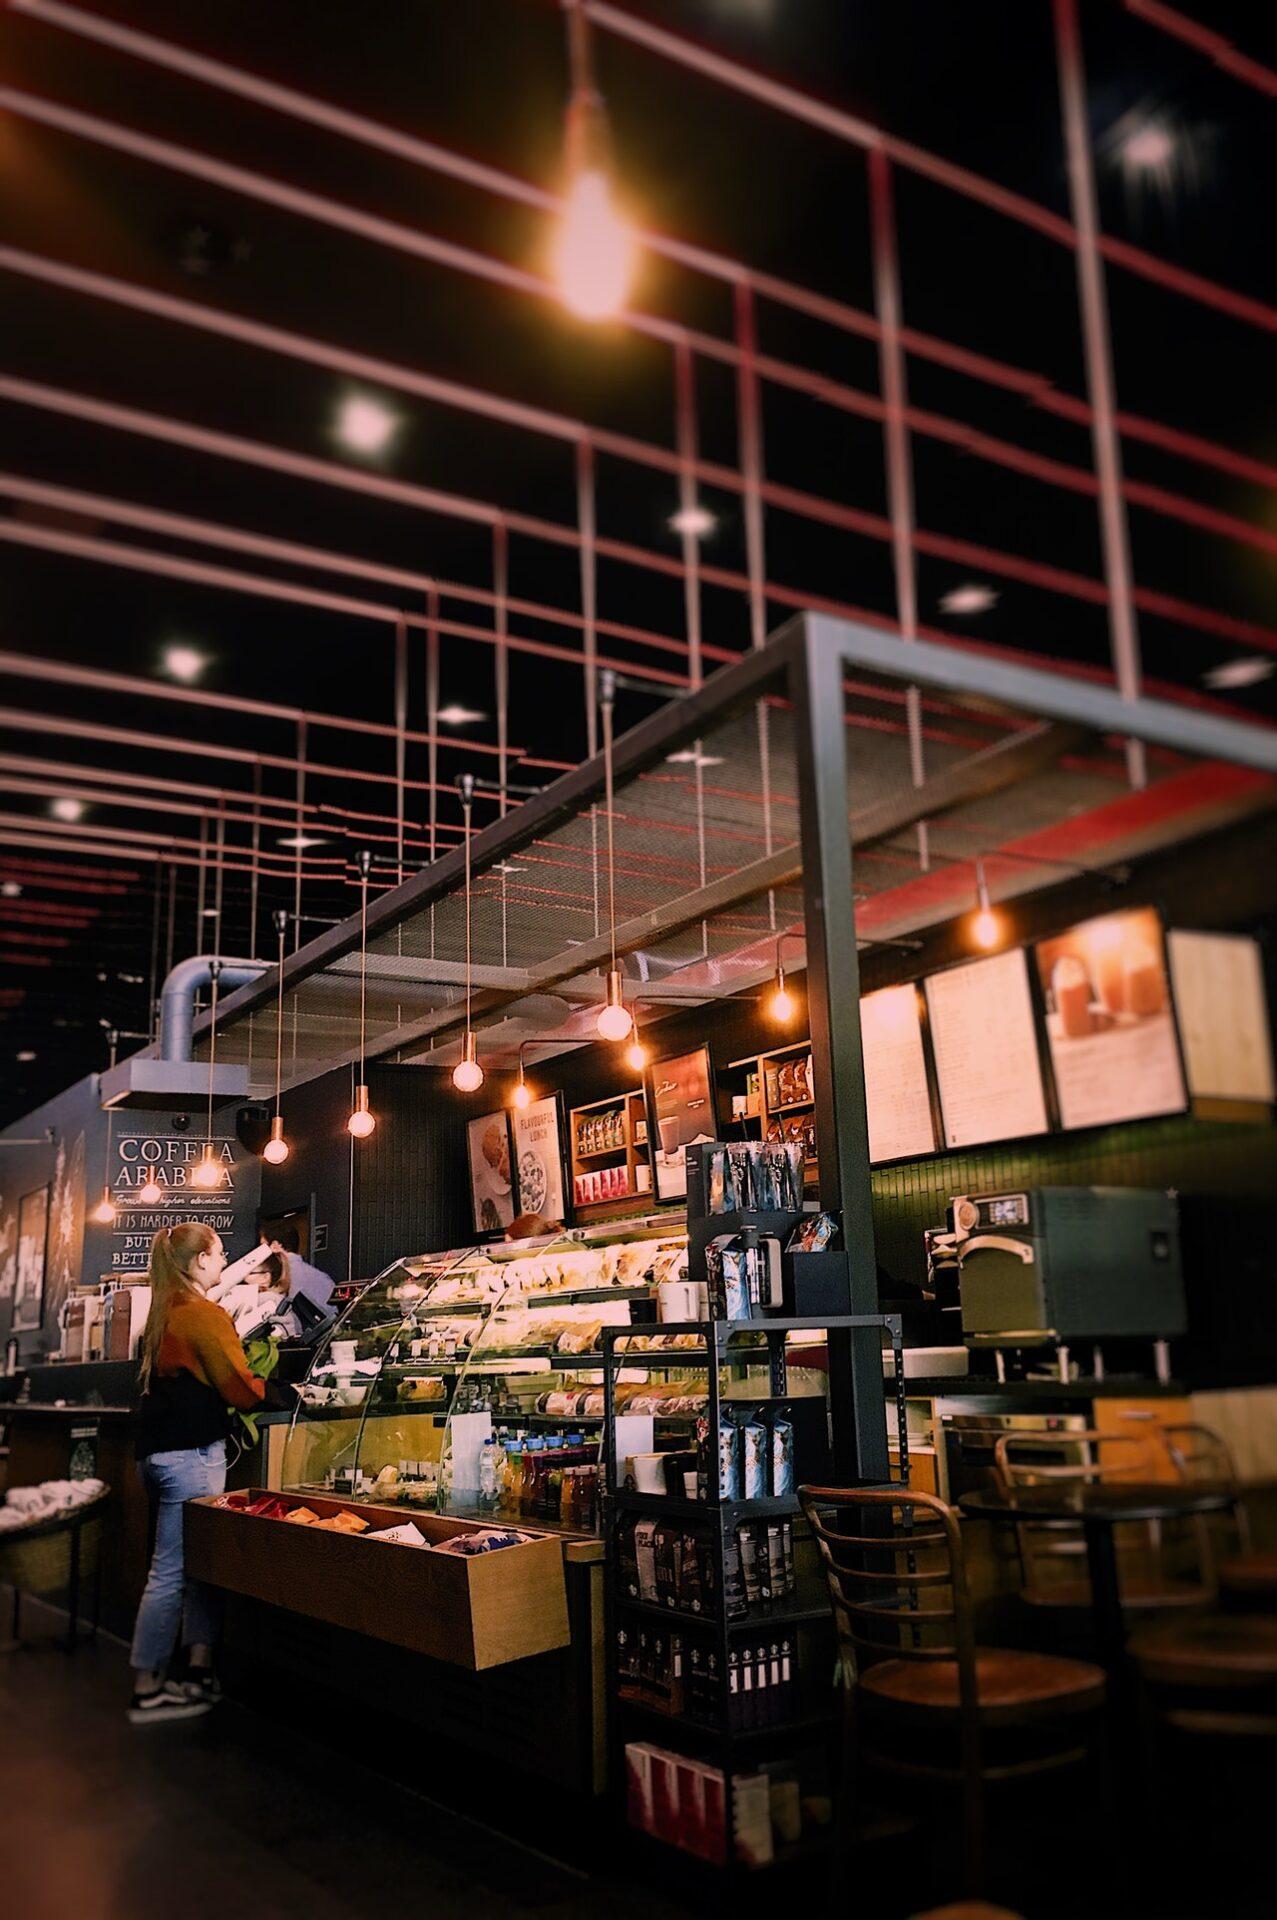 Virtueller Rundgang für Cafés